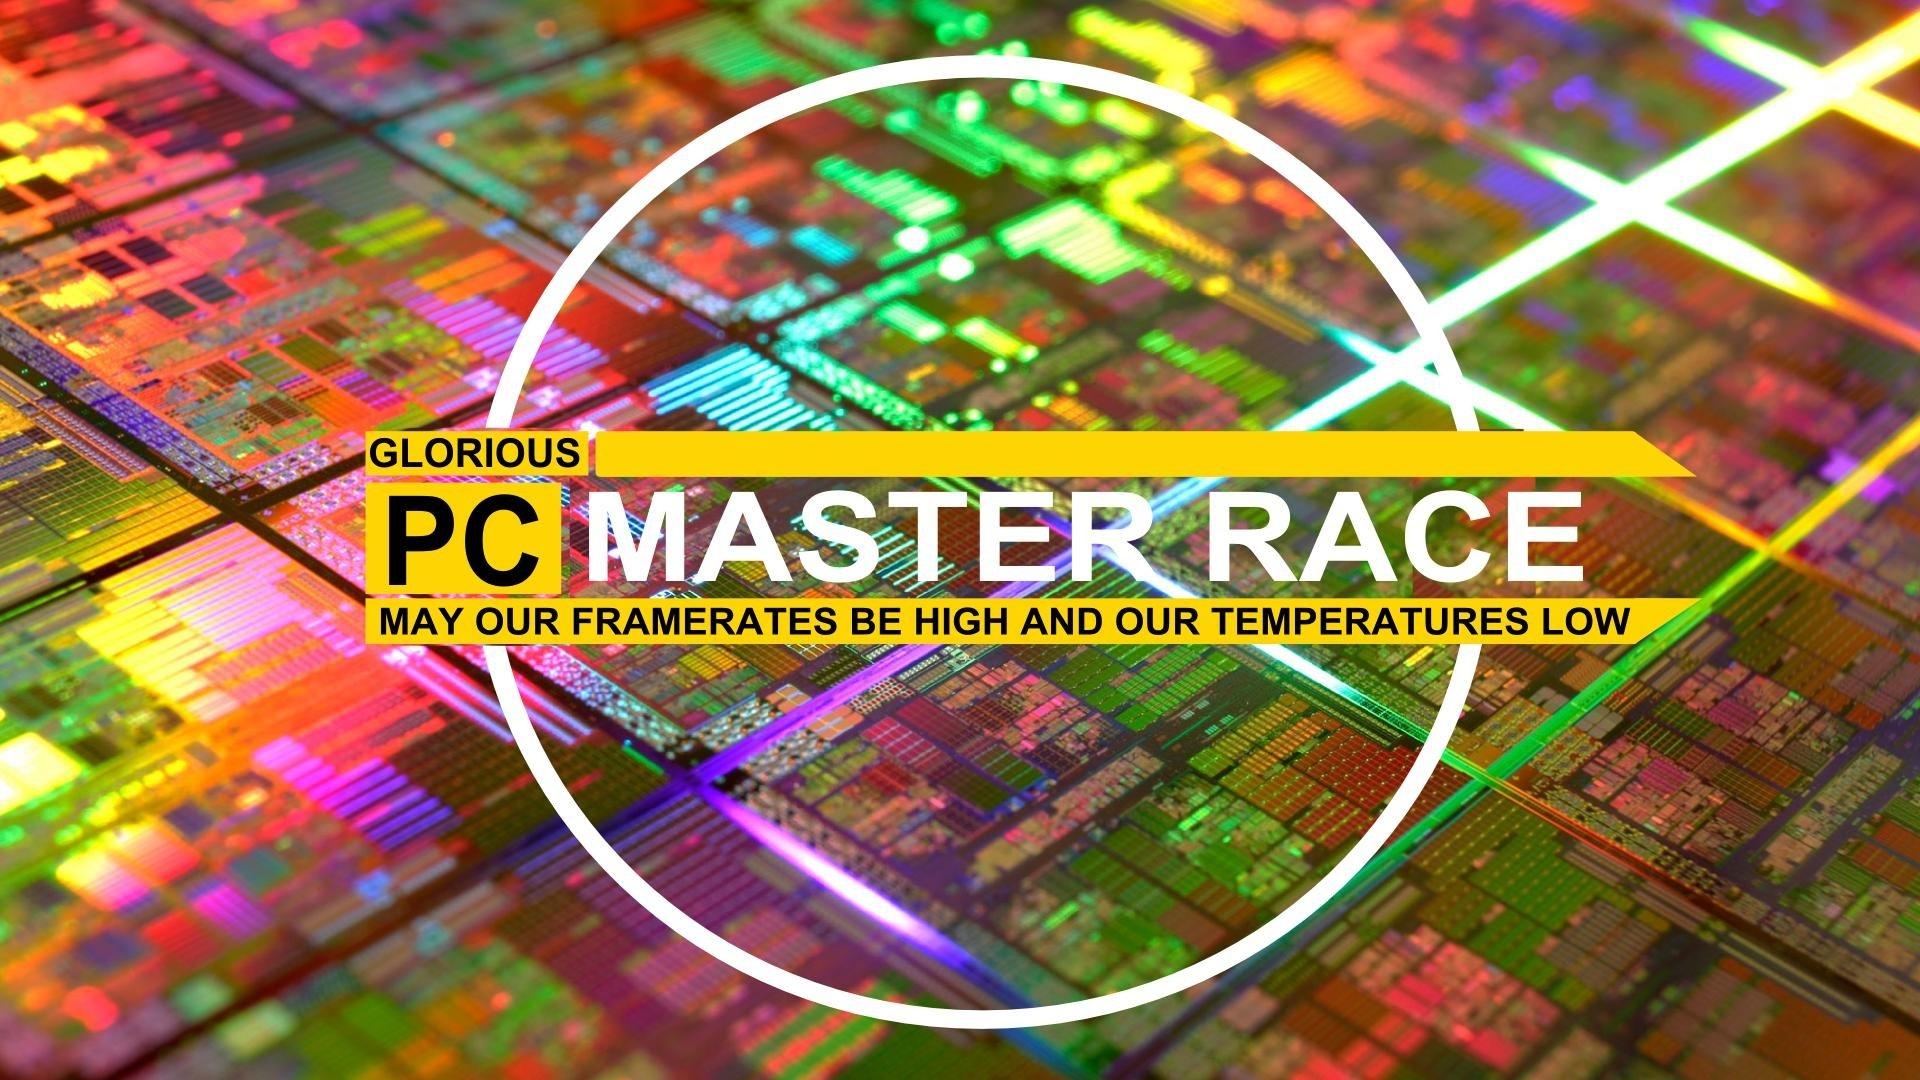 Pc Master Race Hd Wallpaper Background Image 1920x1080 Id